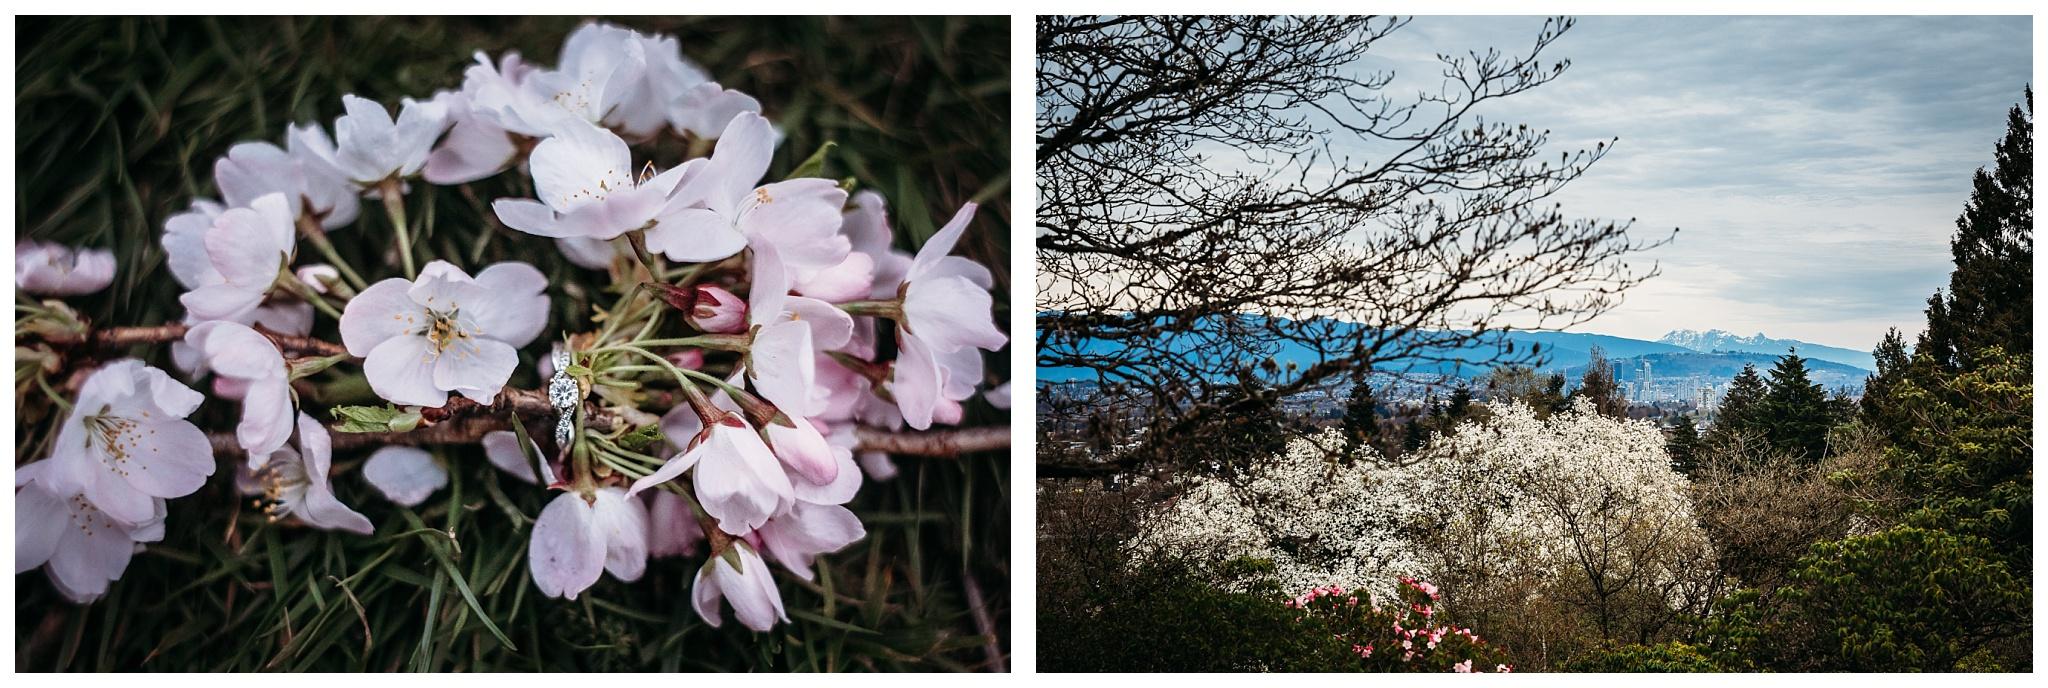 Queen Elizabeth Park Spring Engagement Photography Cherry Blossom Photos Couple Romantic_0015.jpg